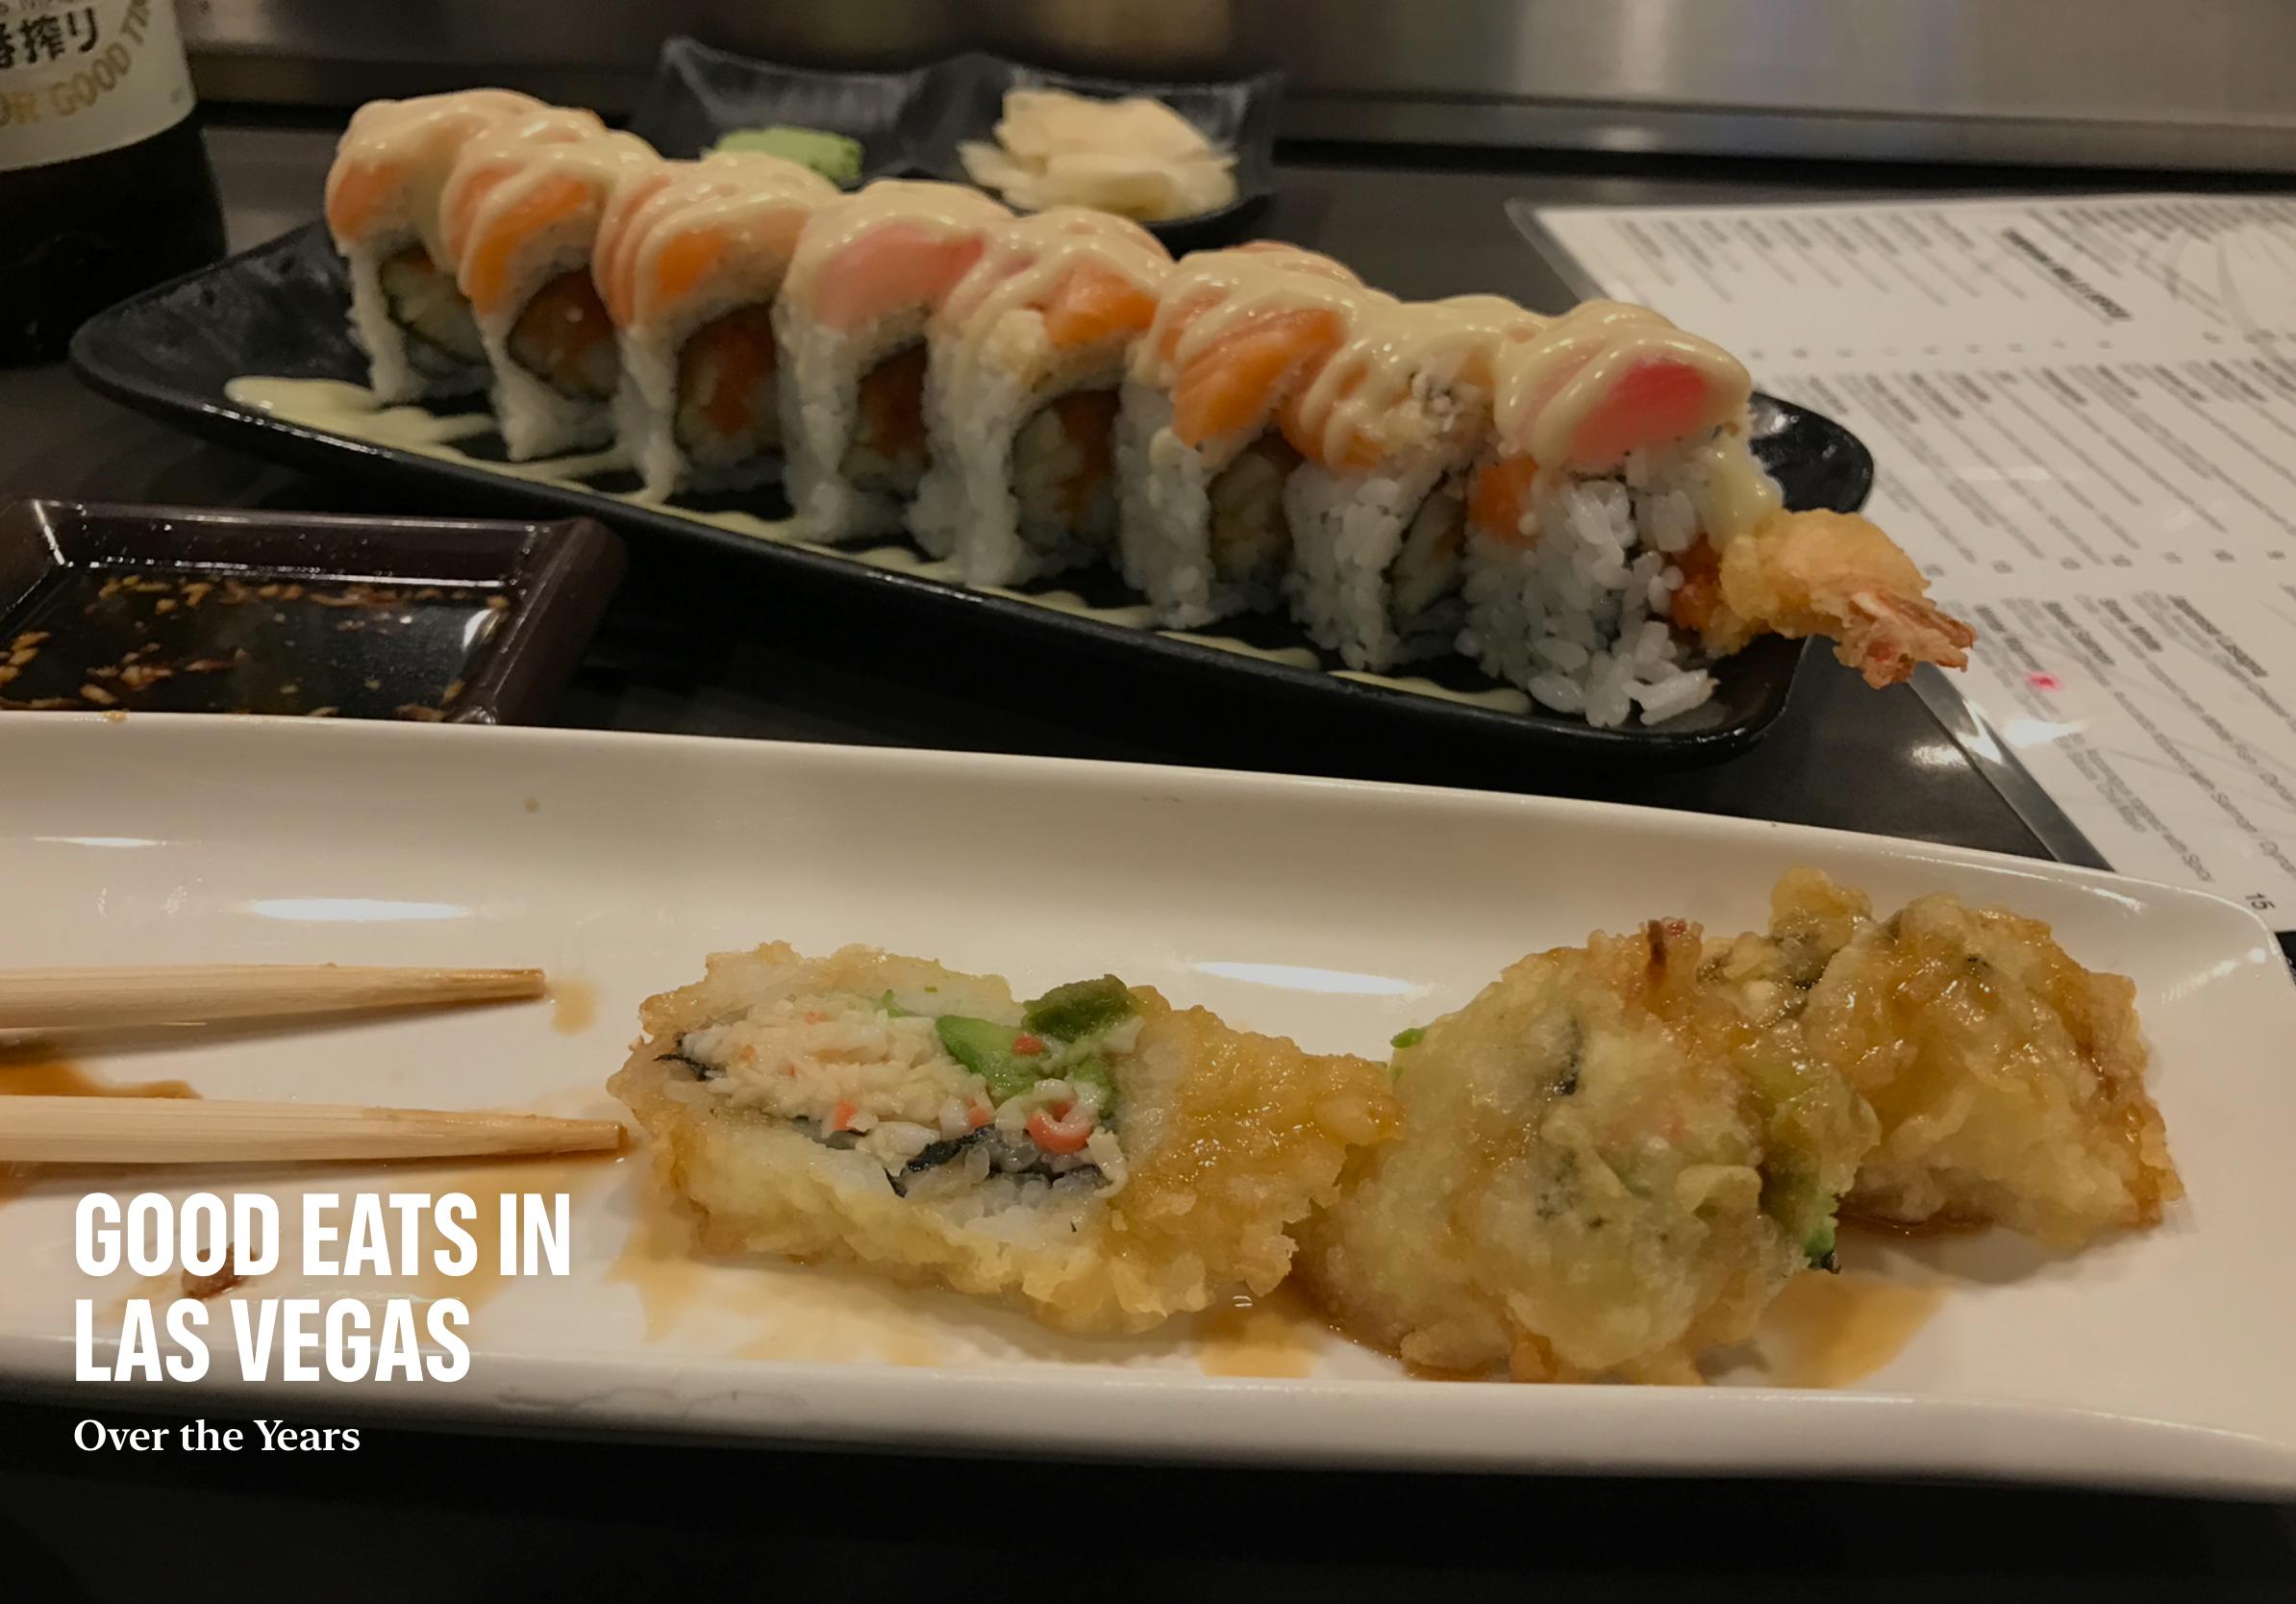 Video Friday: Good Eats in Las Vegas